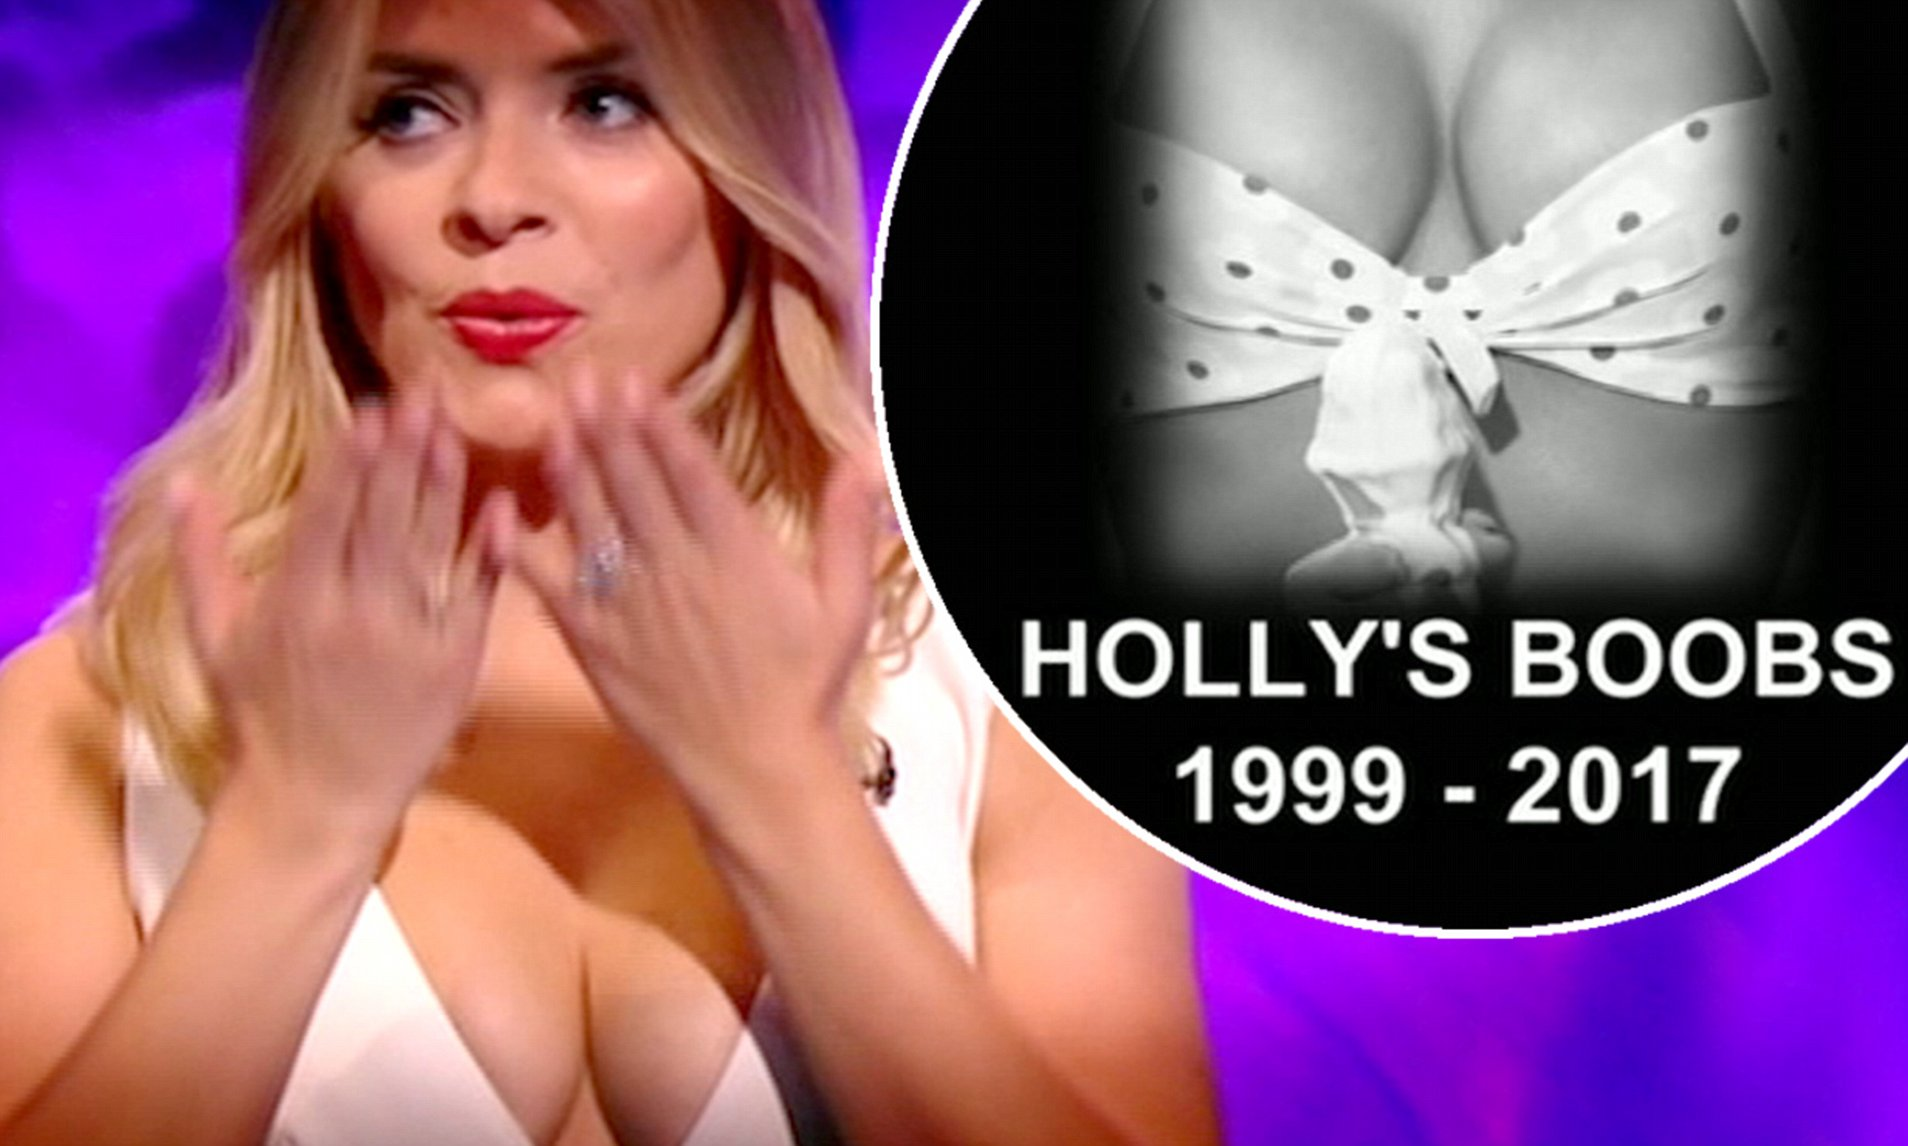 Jessy adams body inflation jessy adams breast expansion